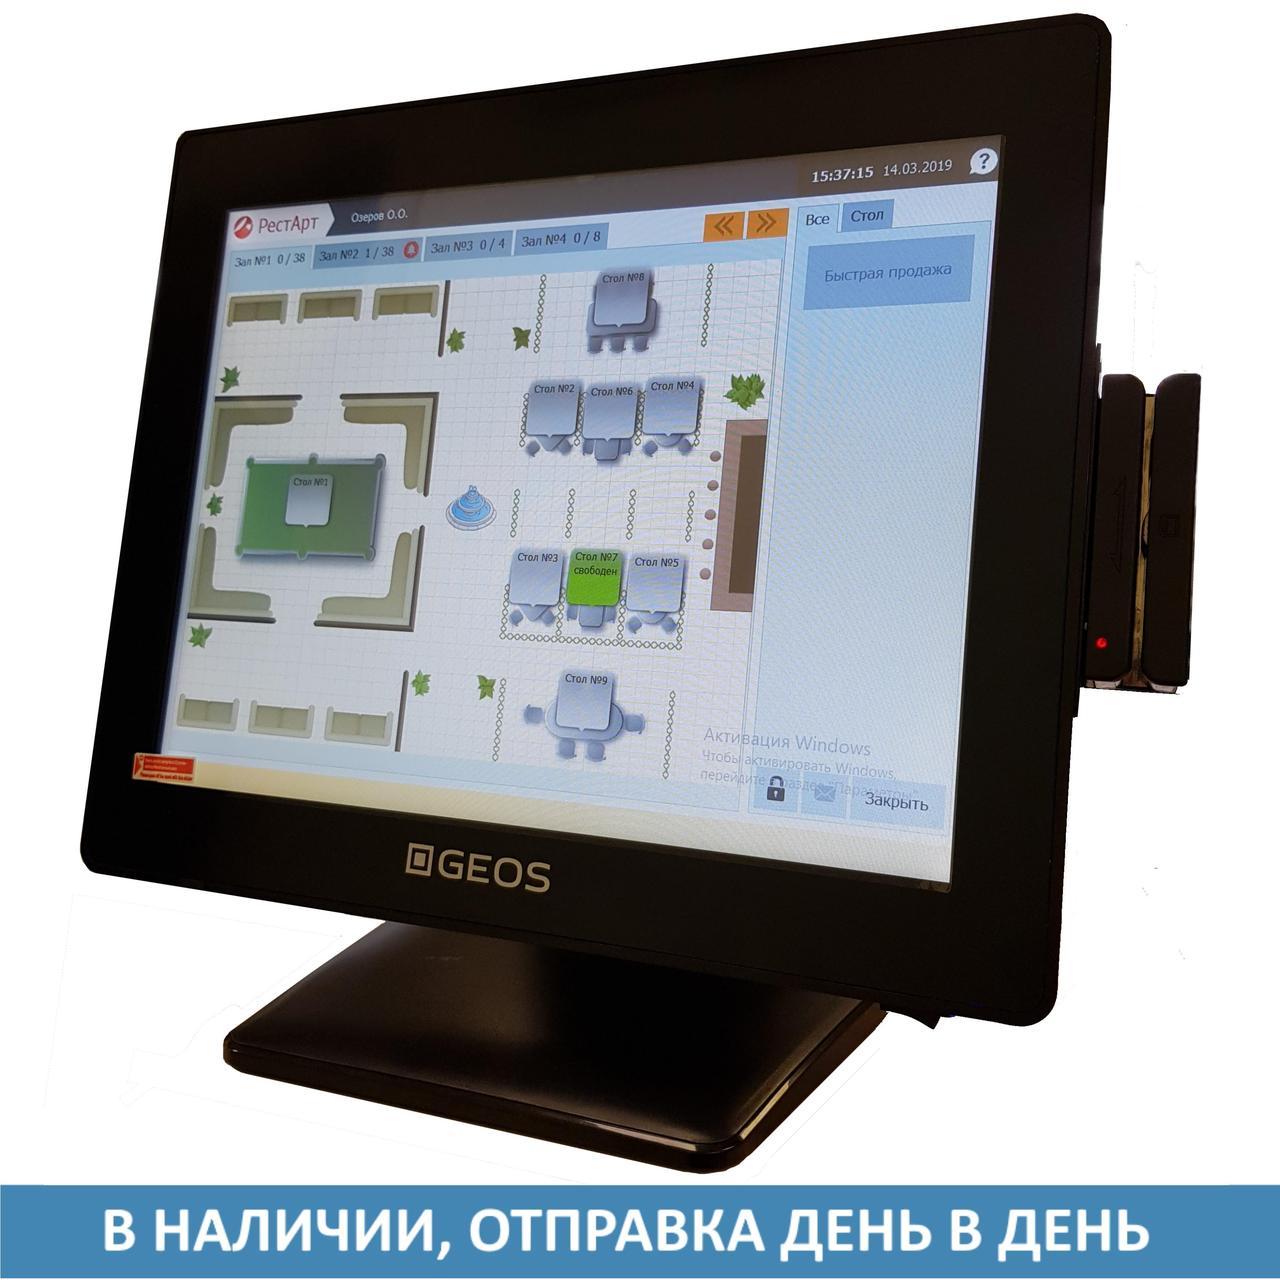 POS-терминал GEOS A1501 Standart